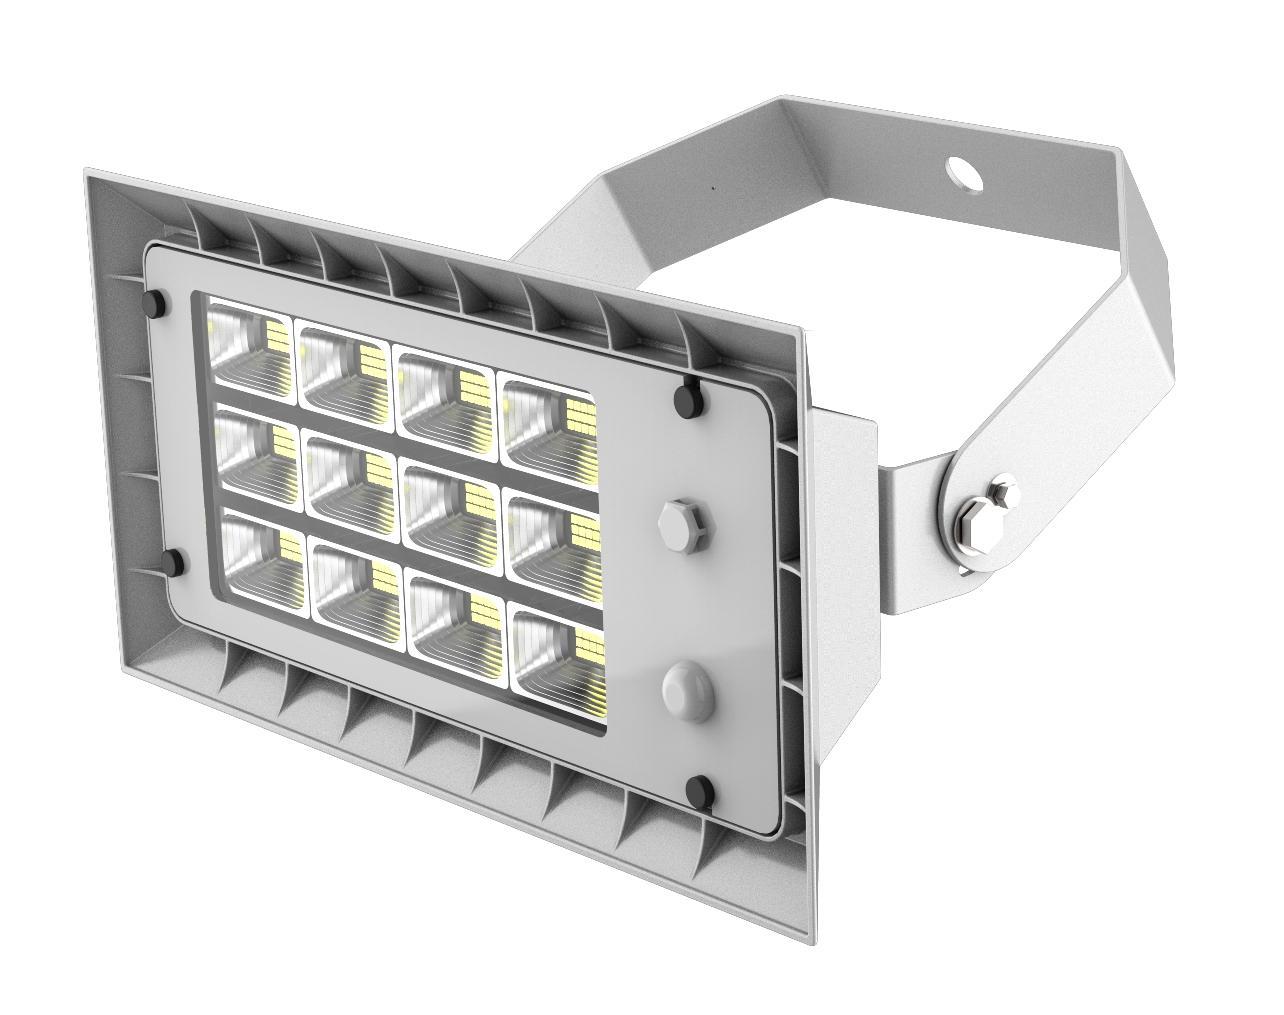 Roof  LED High Bay light 150w led flood light outdoor lighting IP66 waterproof 1